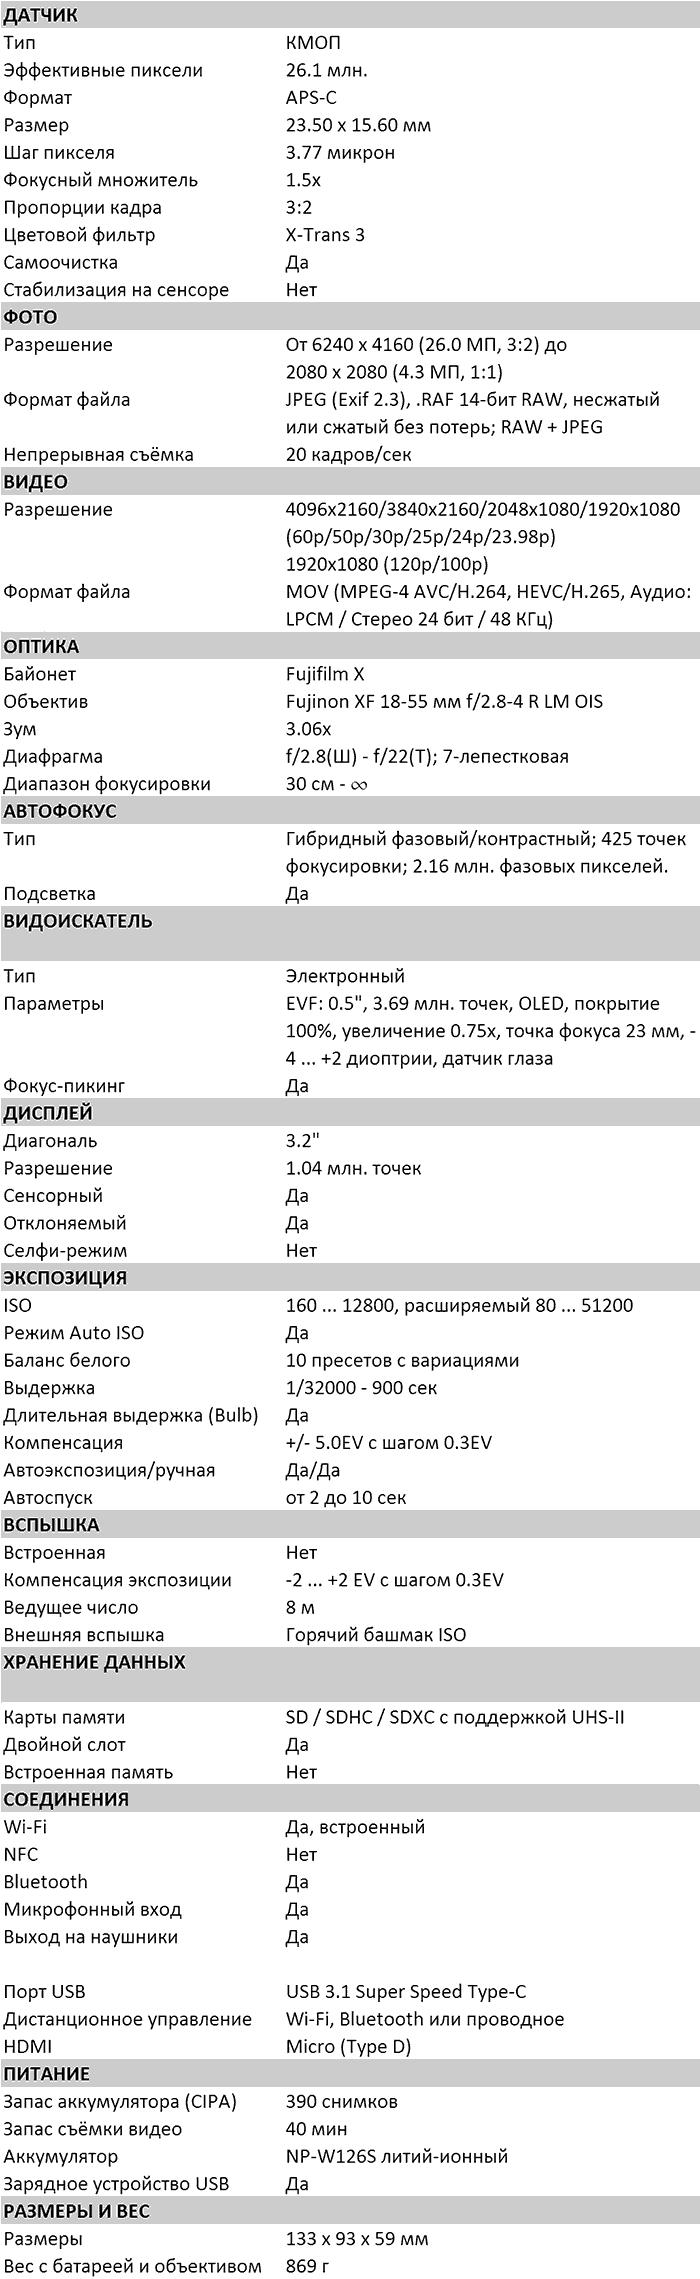 Характеристики X-T3